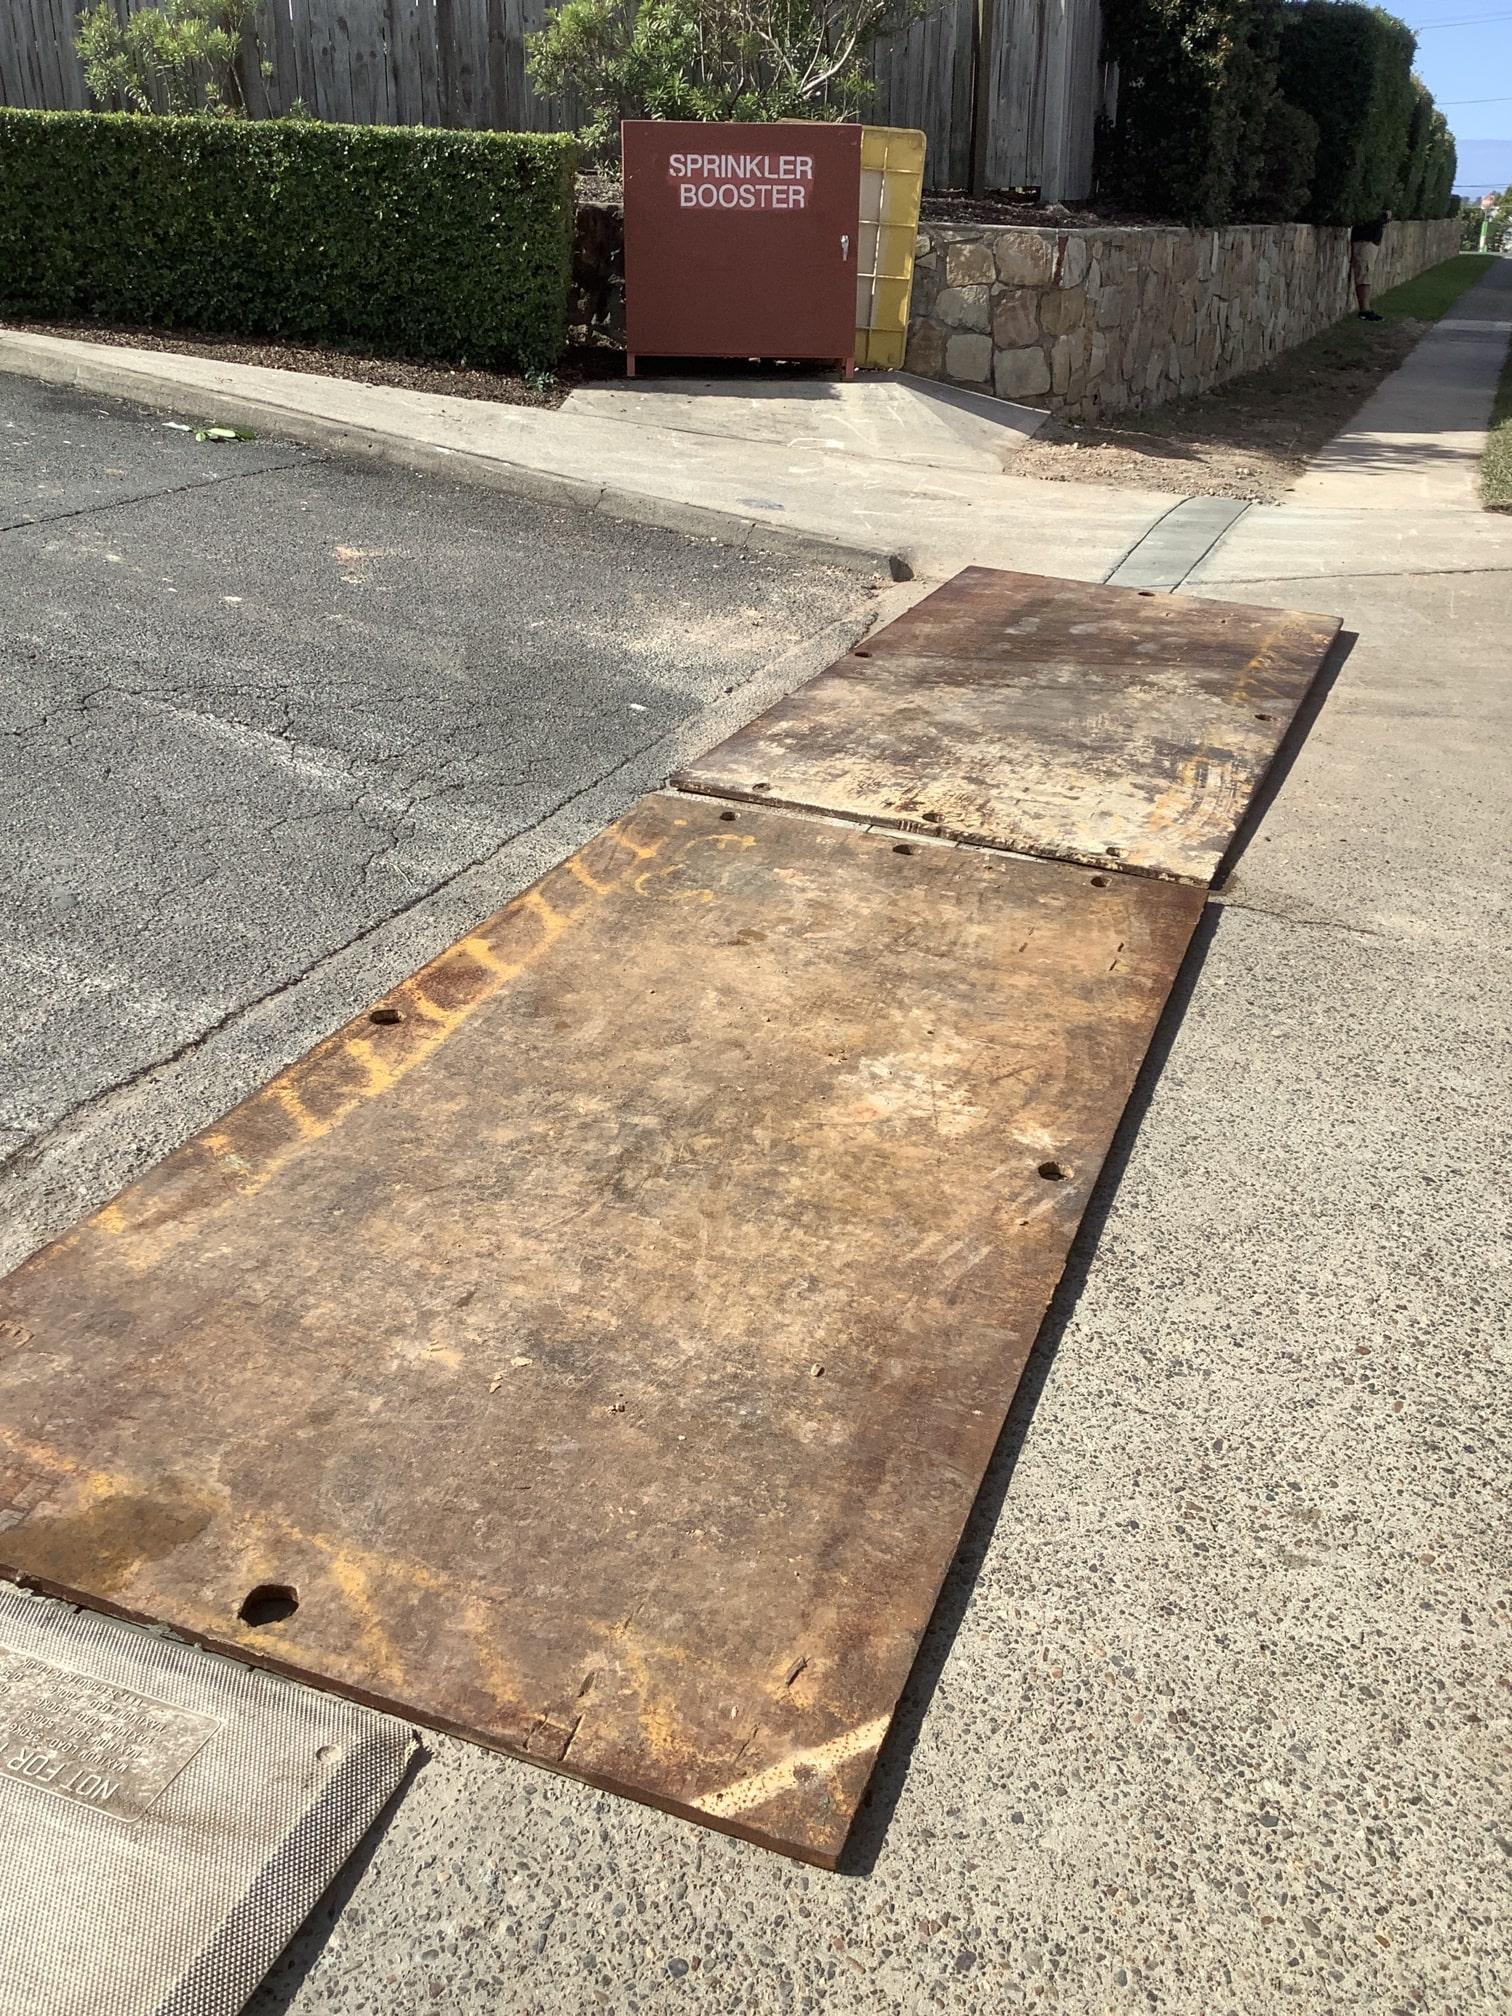 scopecranes steel road plate hire on construction driveway